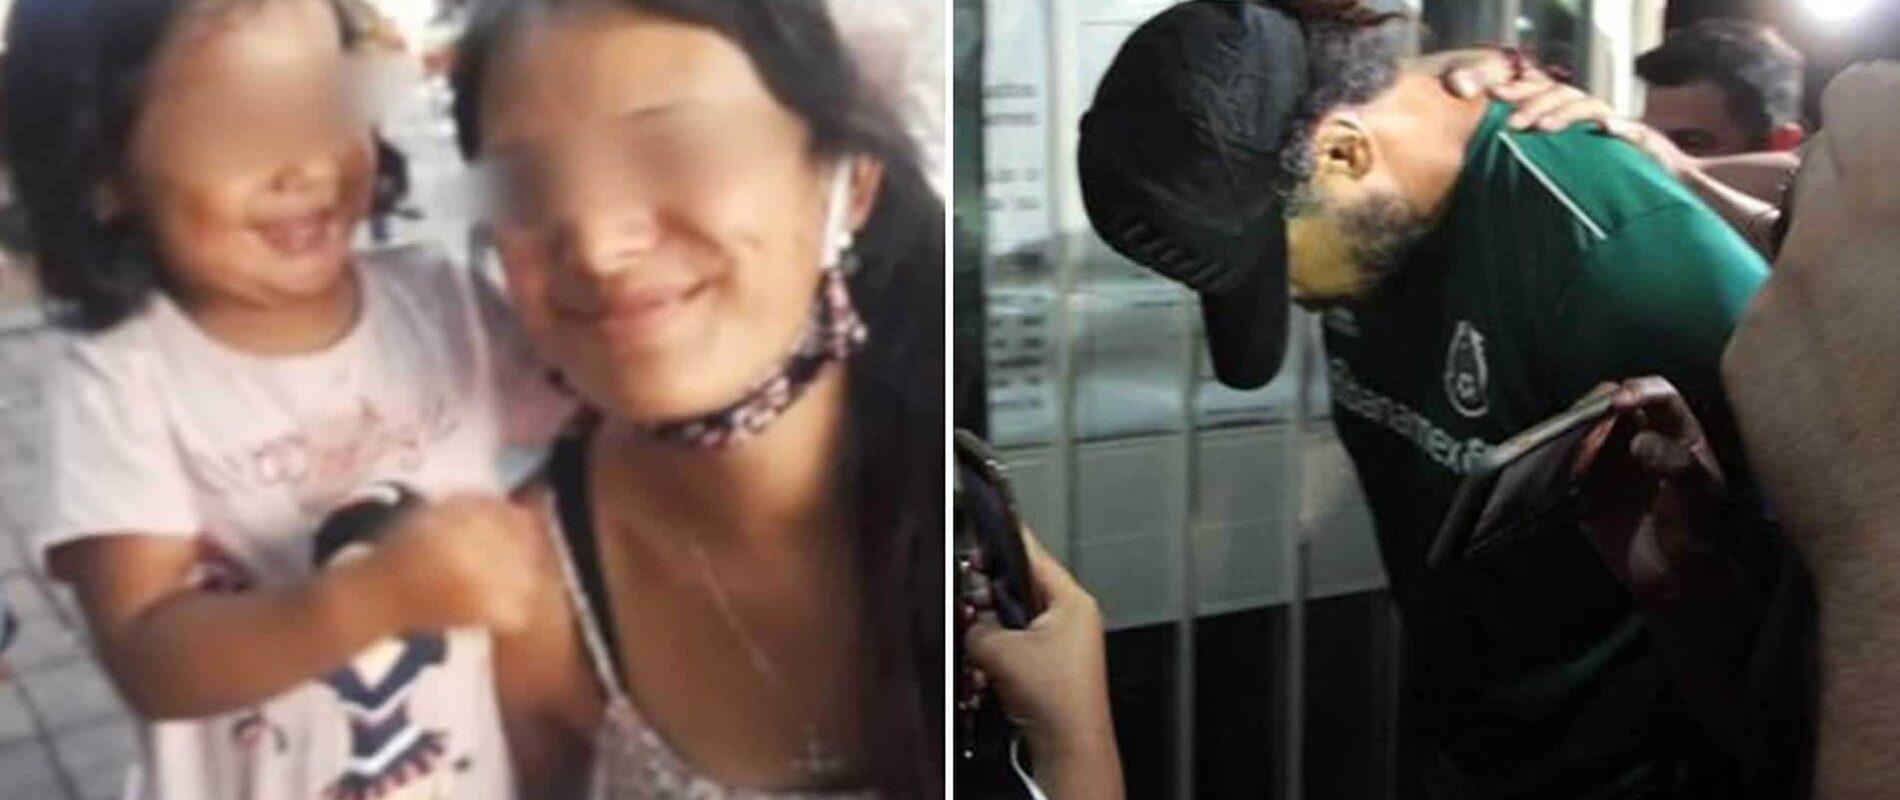 La defensa demostró que Liliana era víctima de violencia del ex Sarapero.